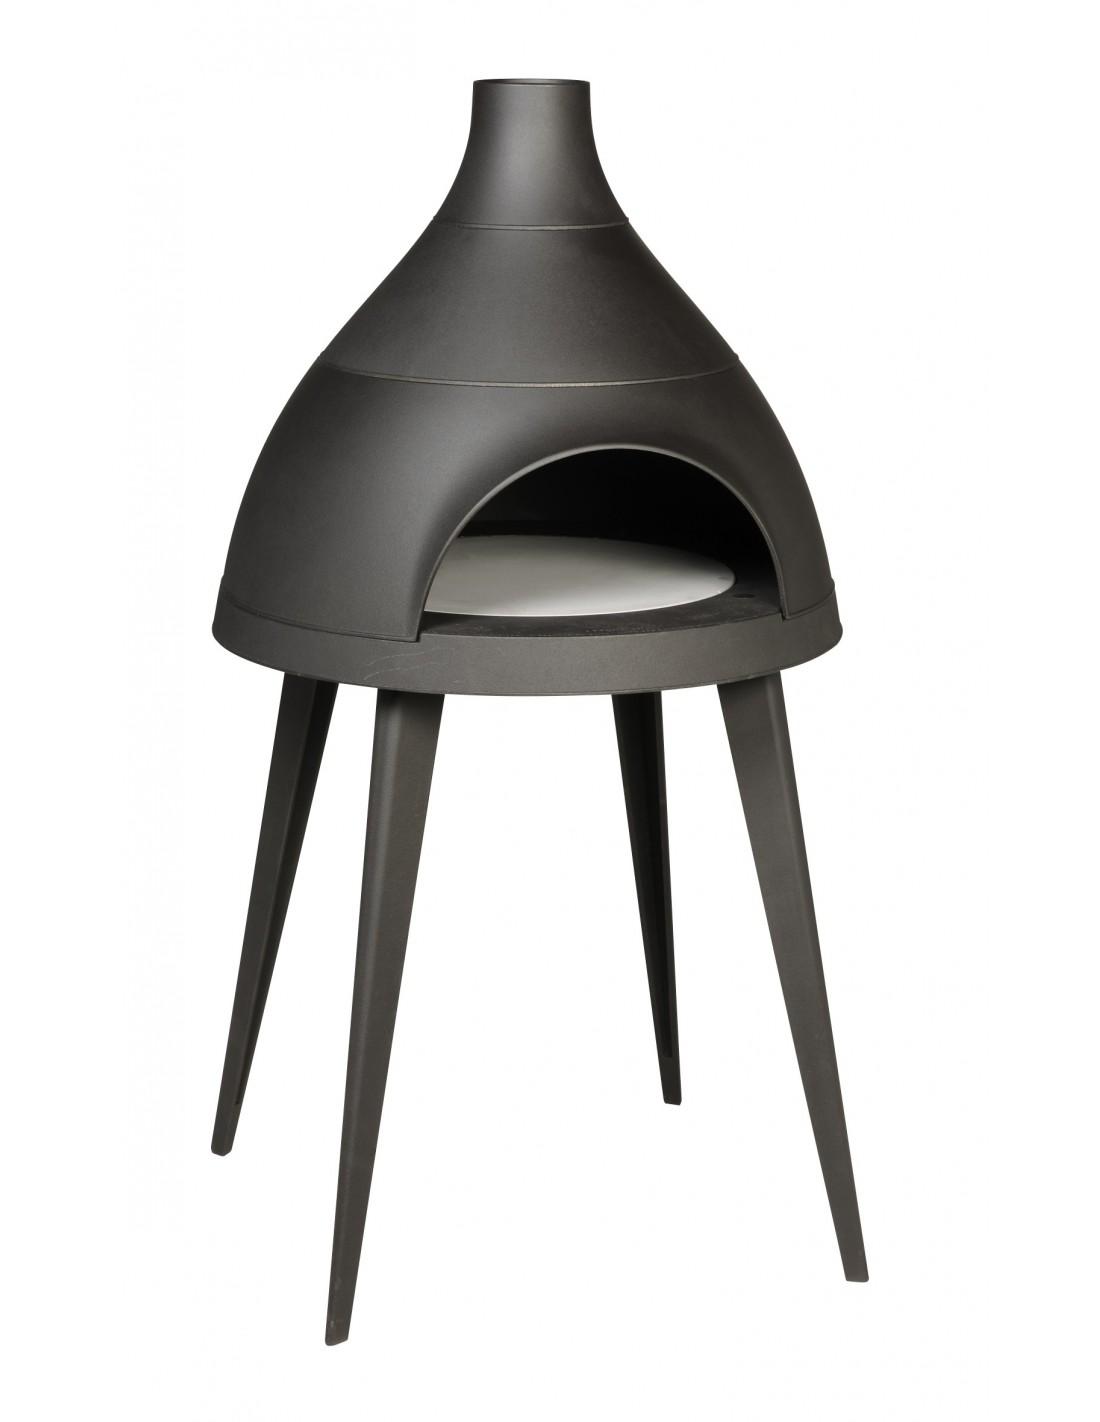 four bois lo cigalou sur pied invicta. Black Bedroom Furniture Sets. Home Design Ideas